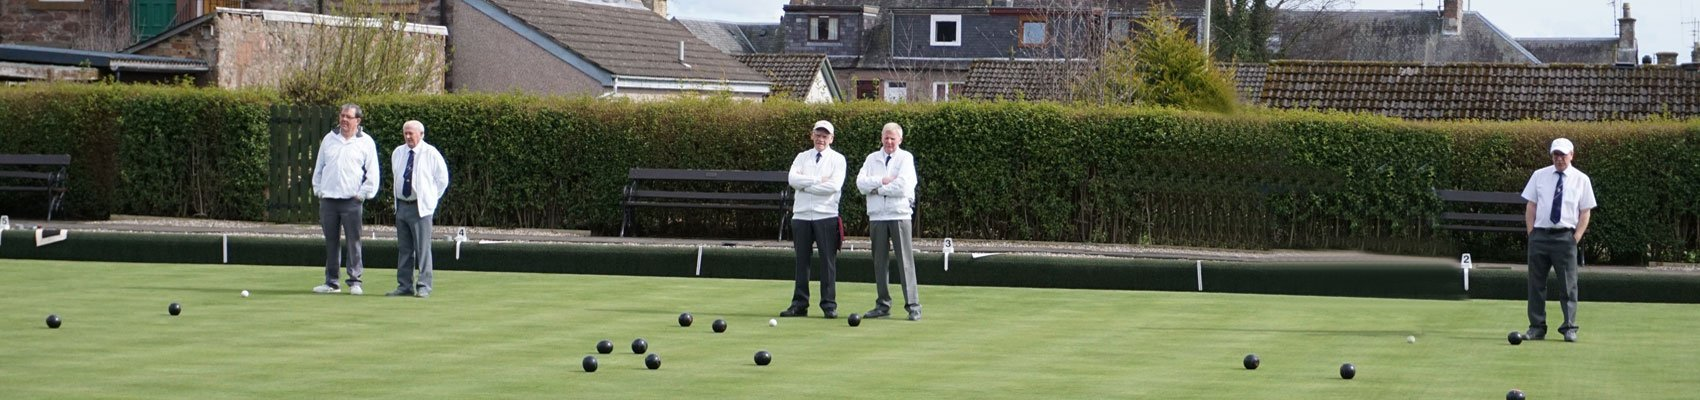 Blairgowrie Bowling Club